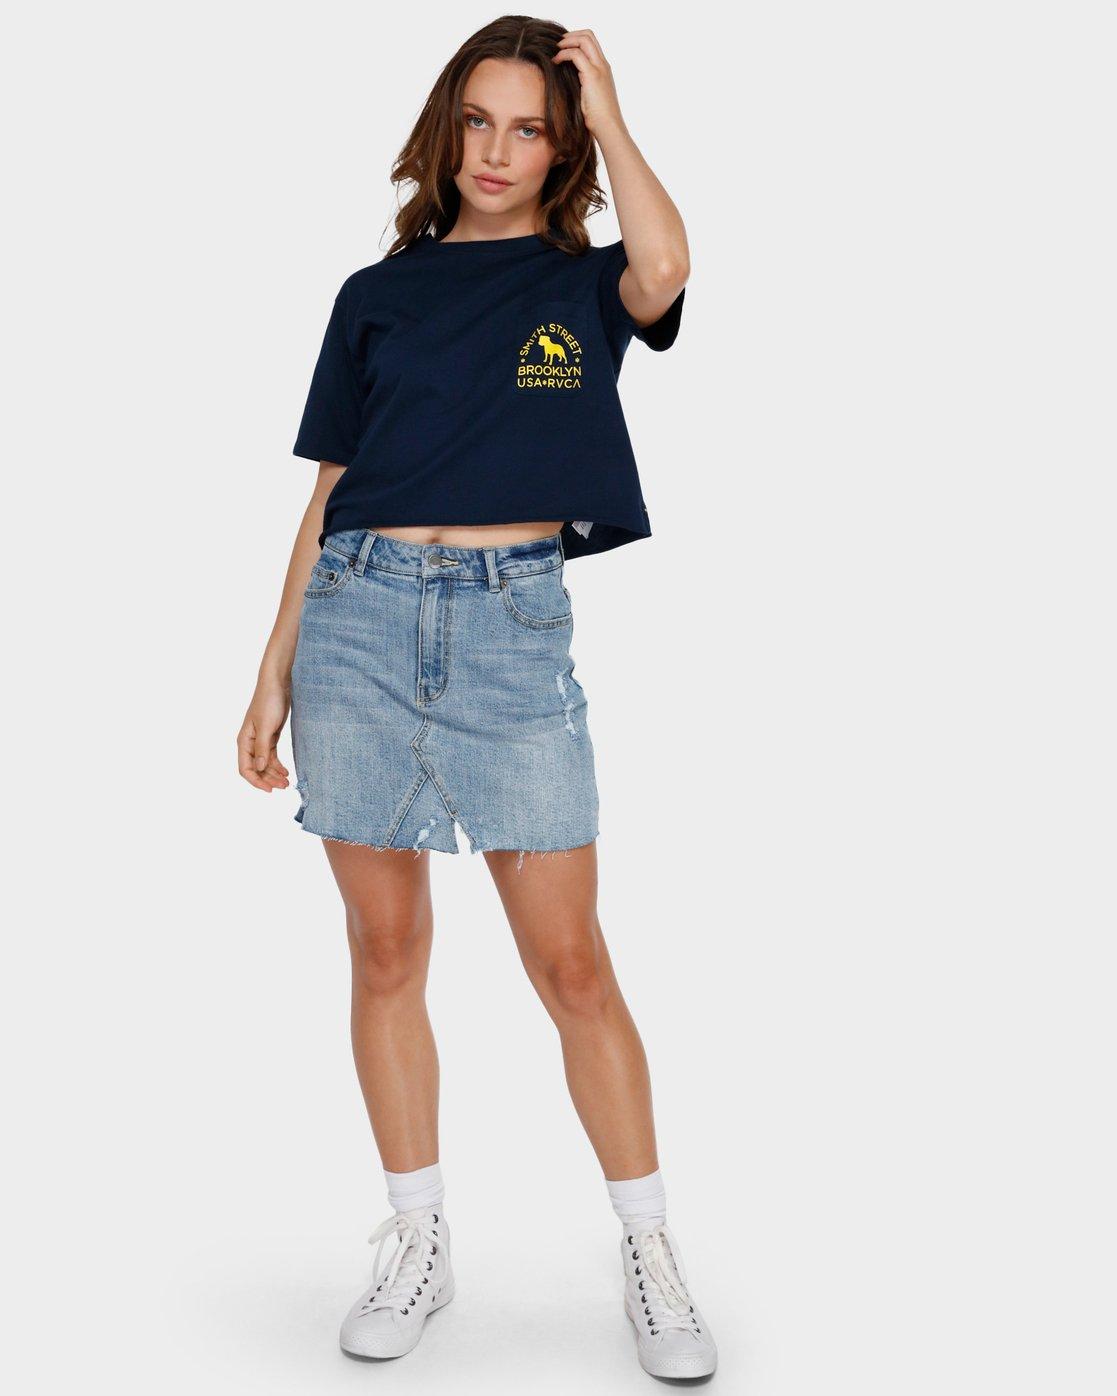 4 Smith Street Pocket T-Shirt Blue R291692 RVCA